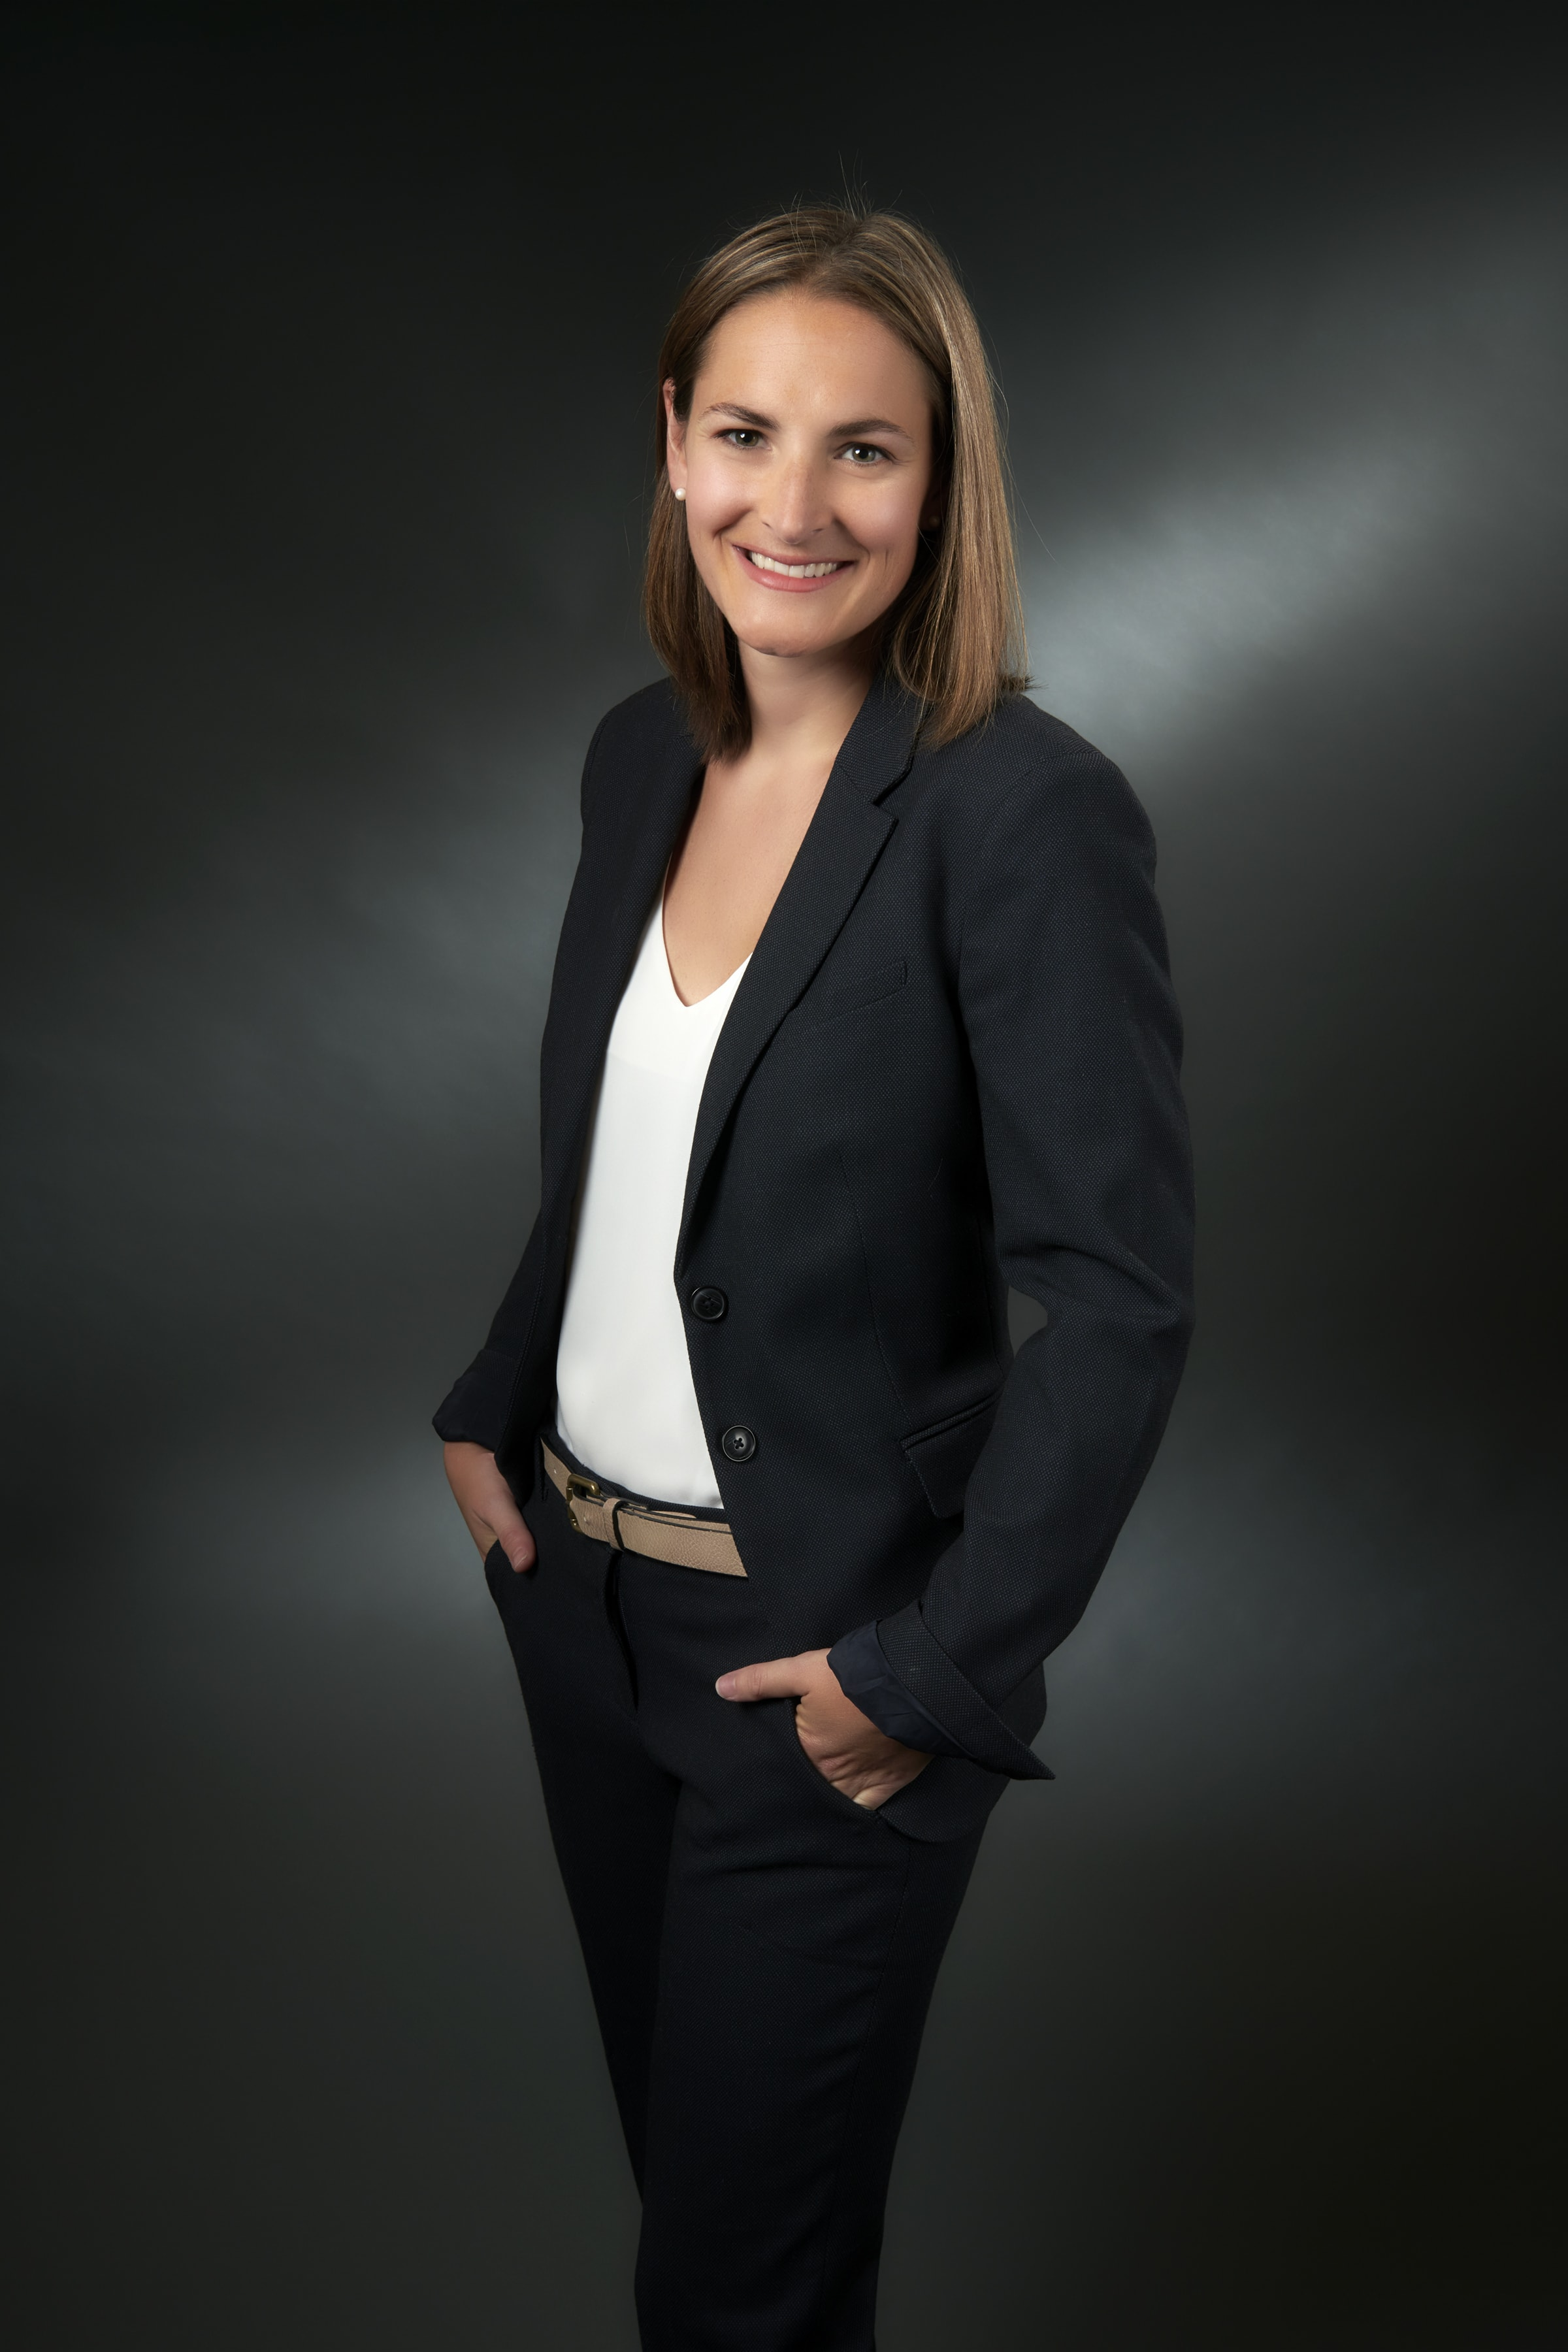 Sophie Vachon-Therrien